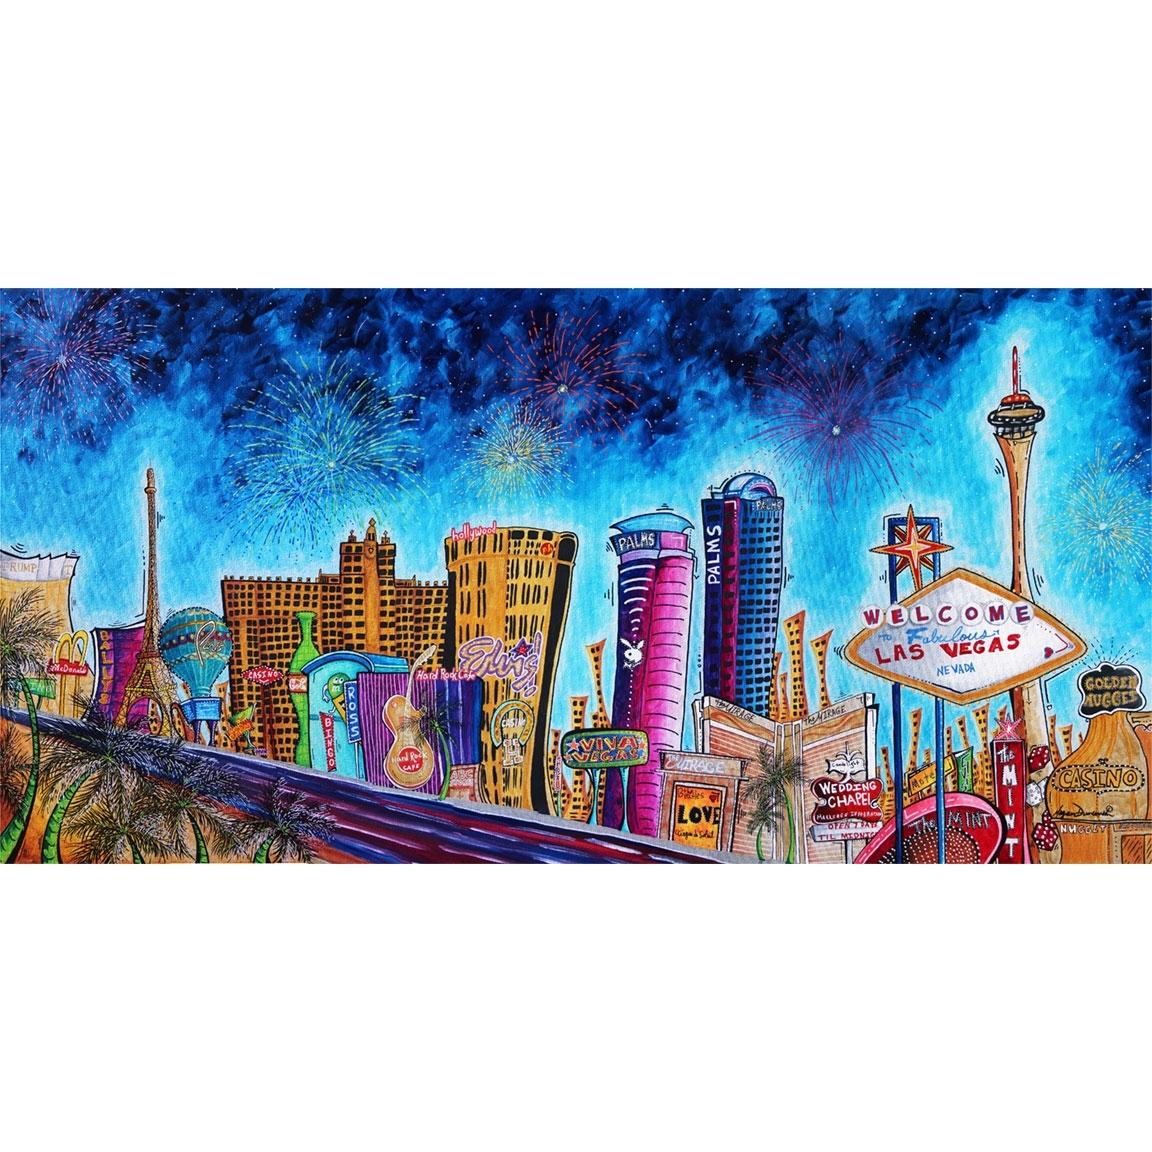 "Viva Las Vegas"" Original Pop Art Style Colorful Vegas Strip Intended For 2017 Las Vegas Canvas Wall Art (View 13 of 15)"